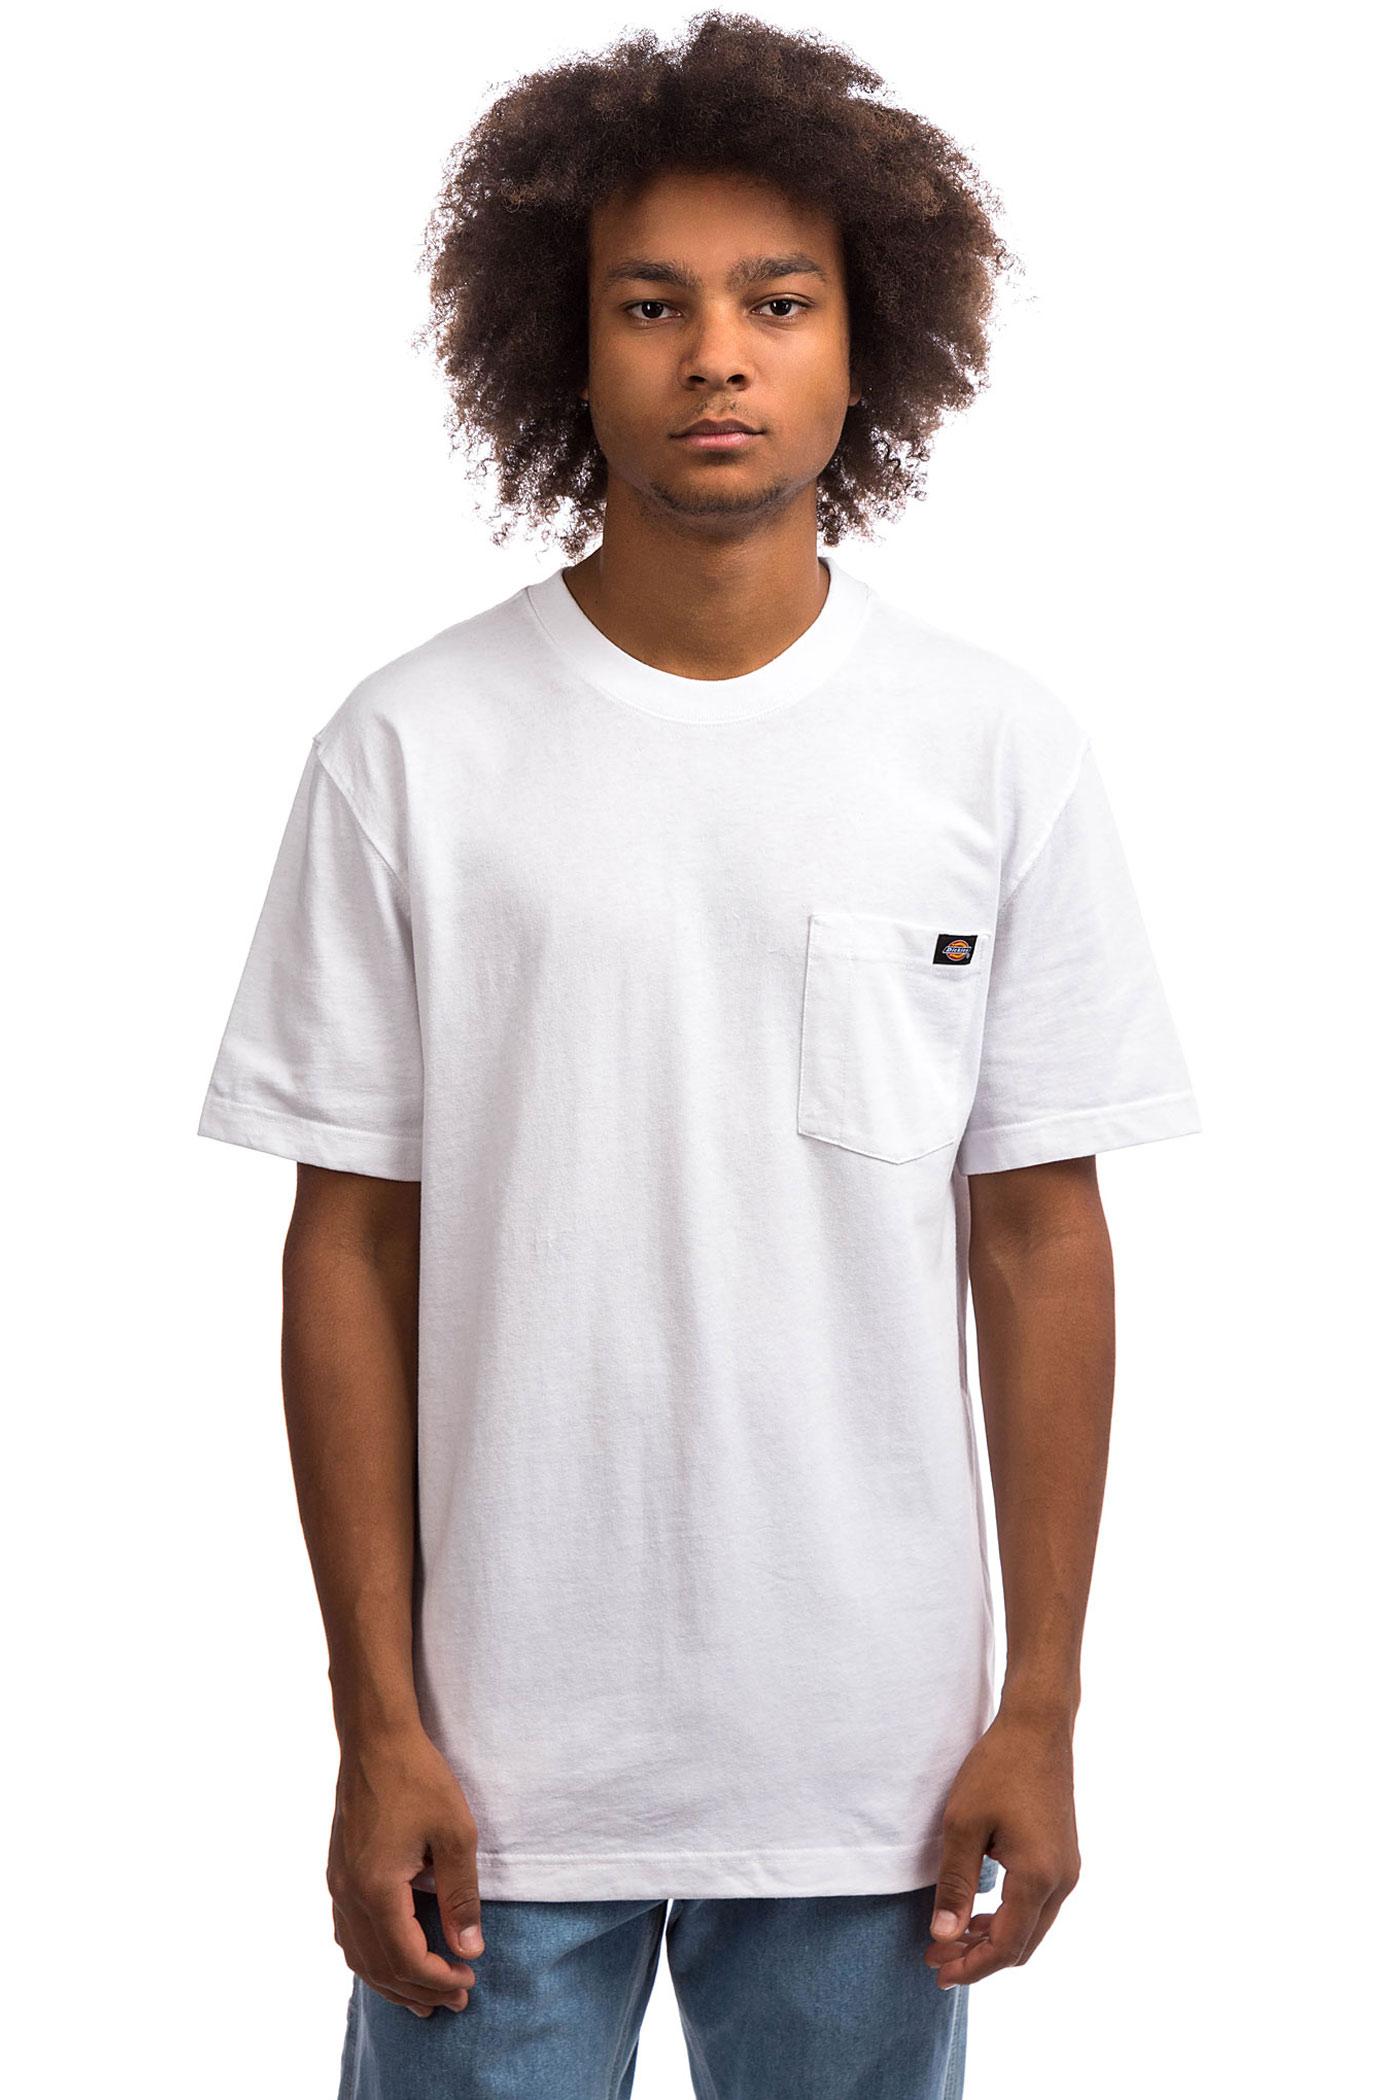 S Dickies shirtwhite Pocket s T 1TF3JclK